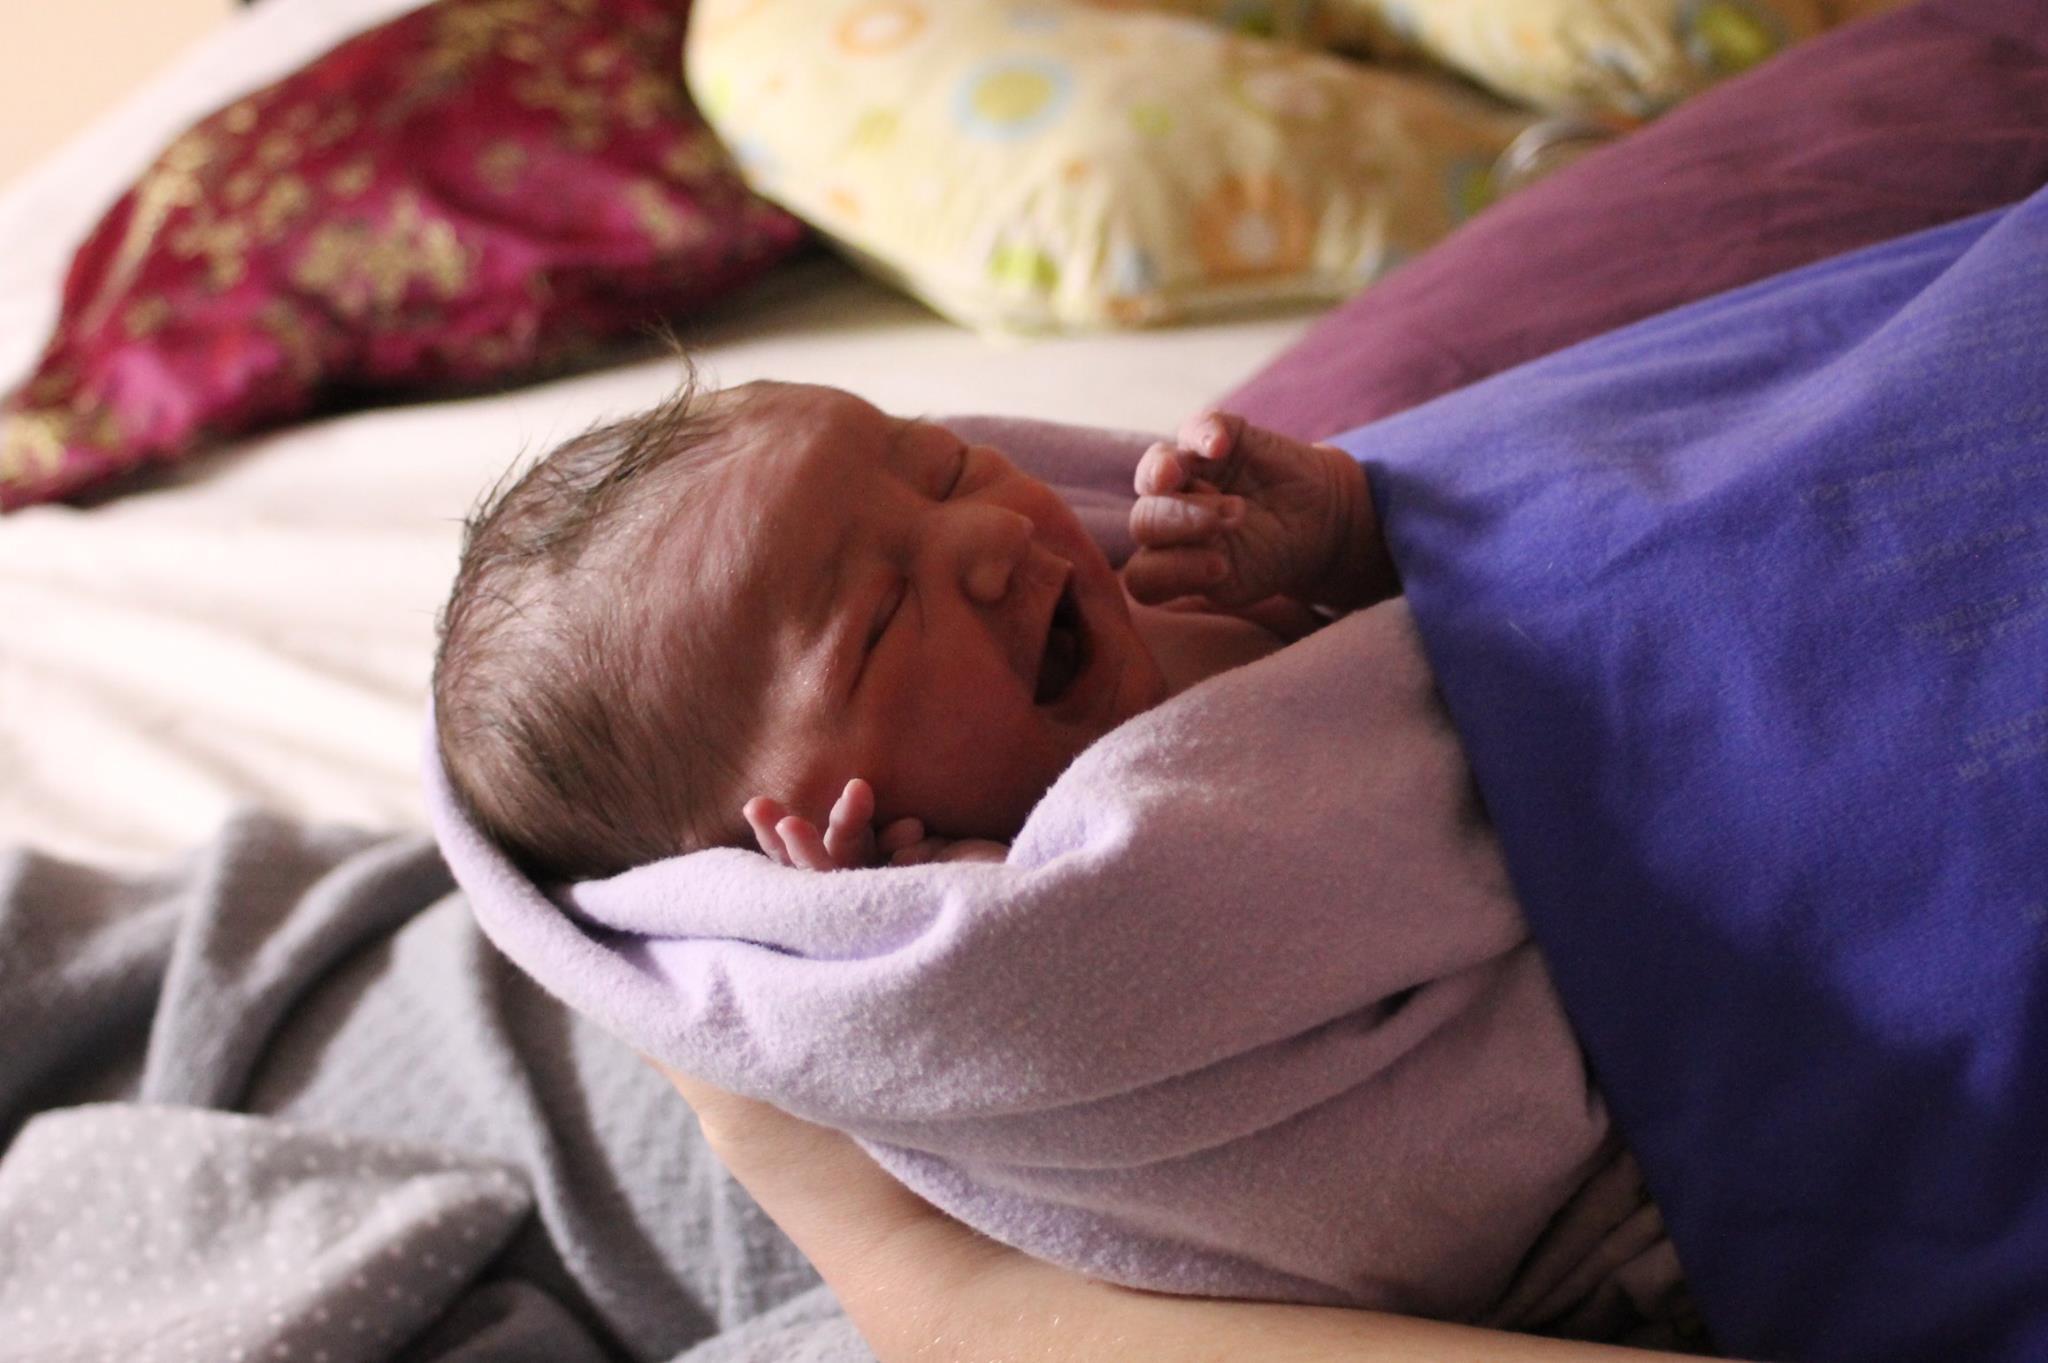 HazelTree Midwifery, home birth, water birth, out of hospital birth